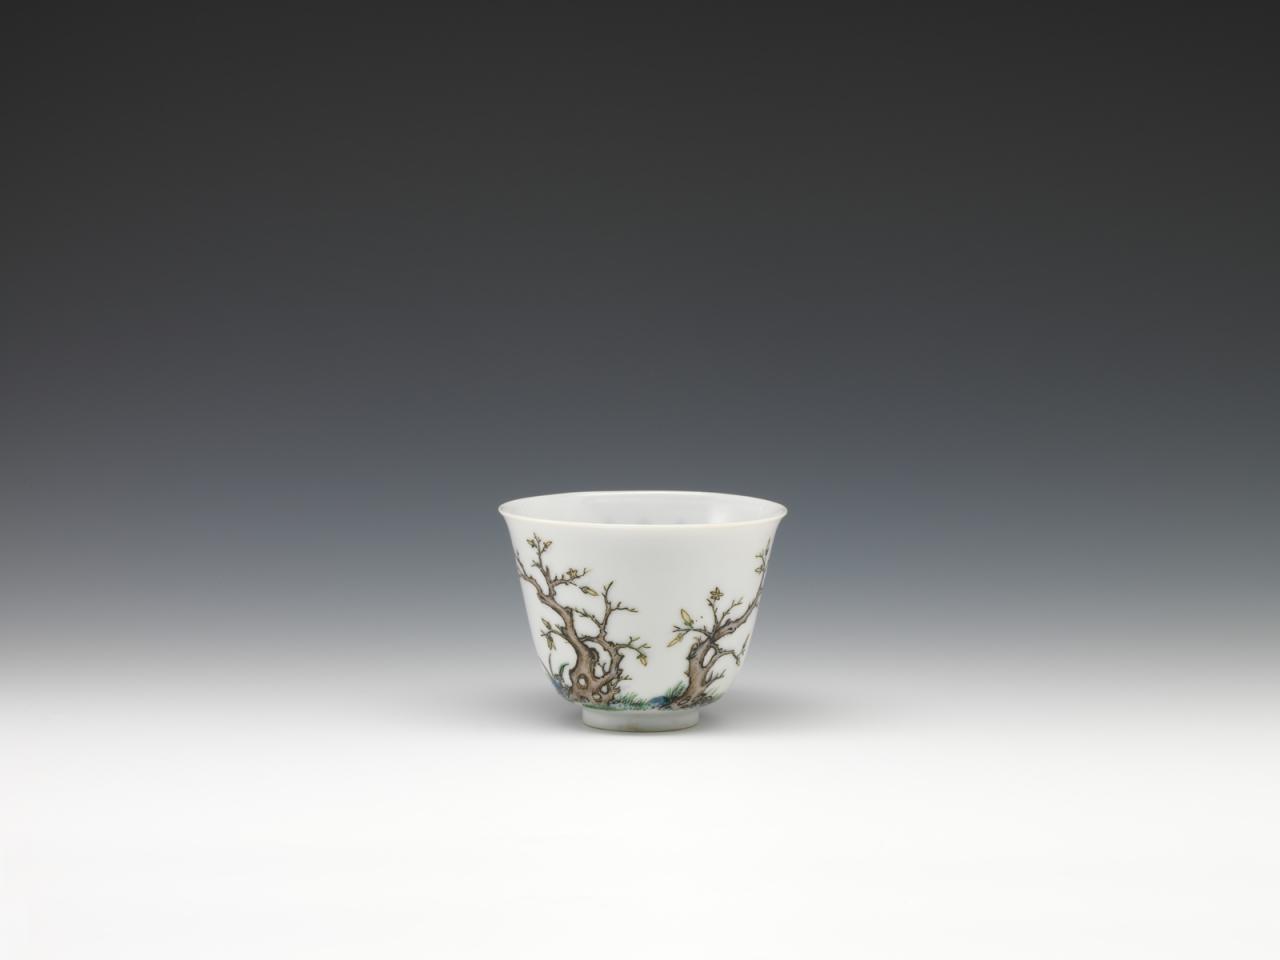 Twelve cups with flowers representing the twelve months in wucai enamels-June image